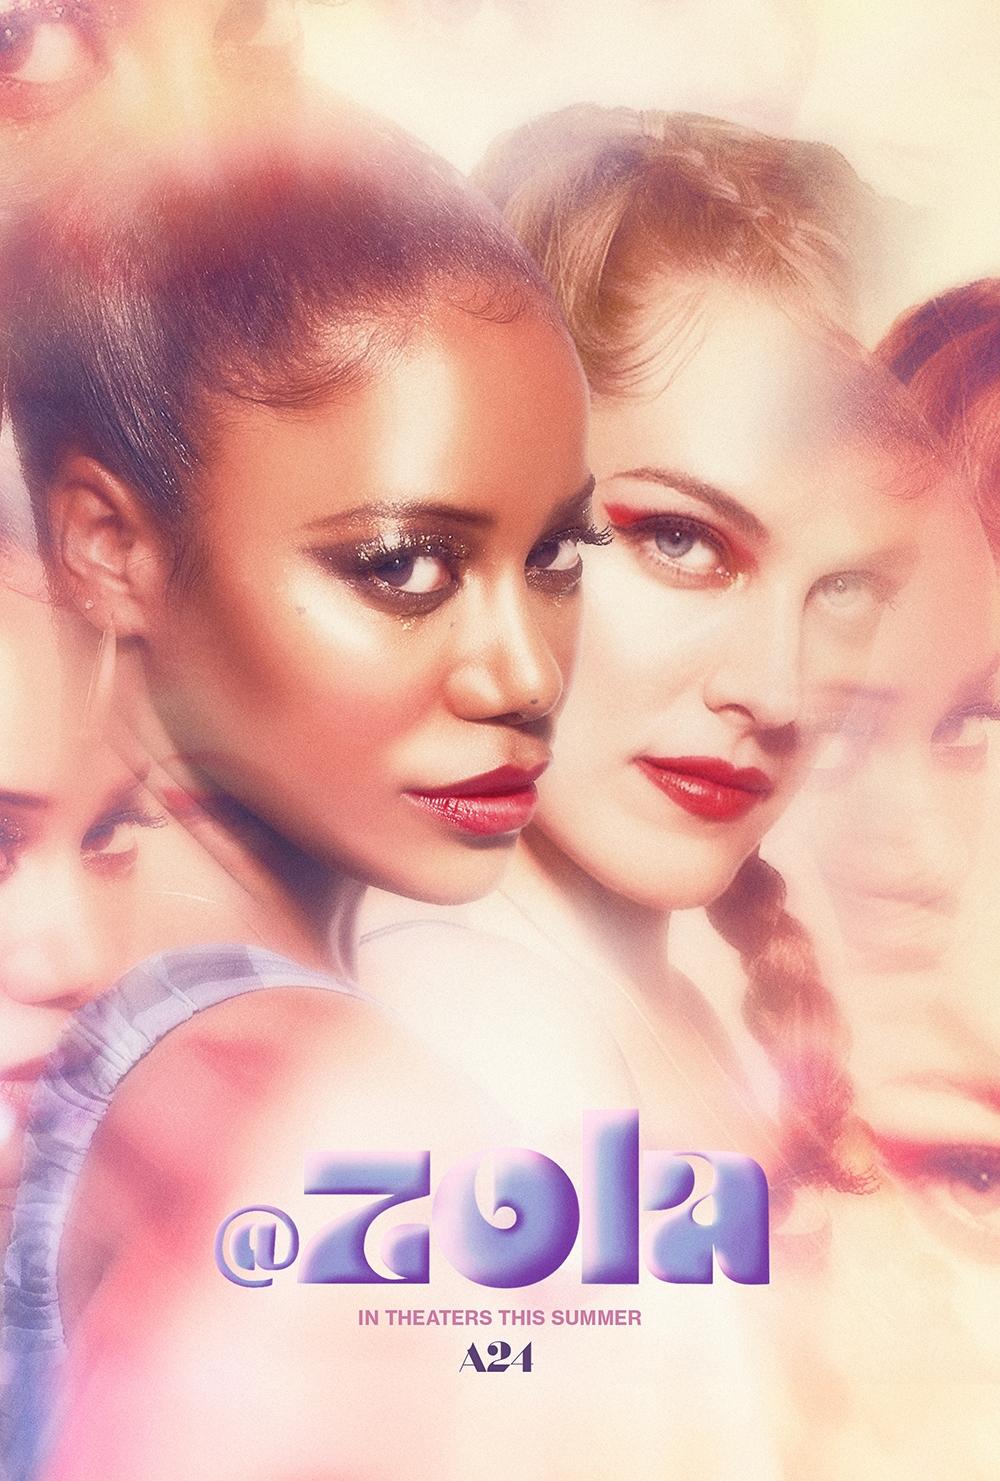 Zola film poster